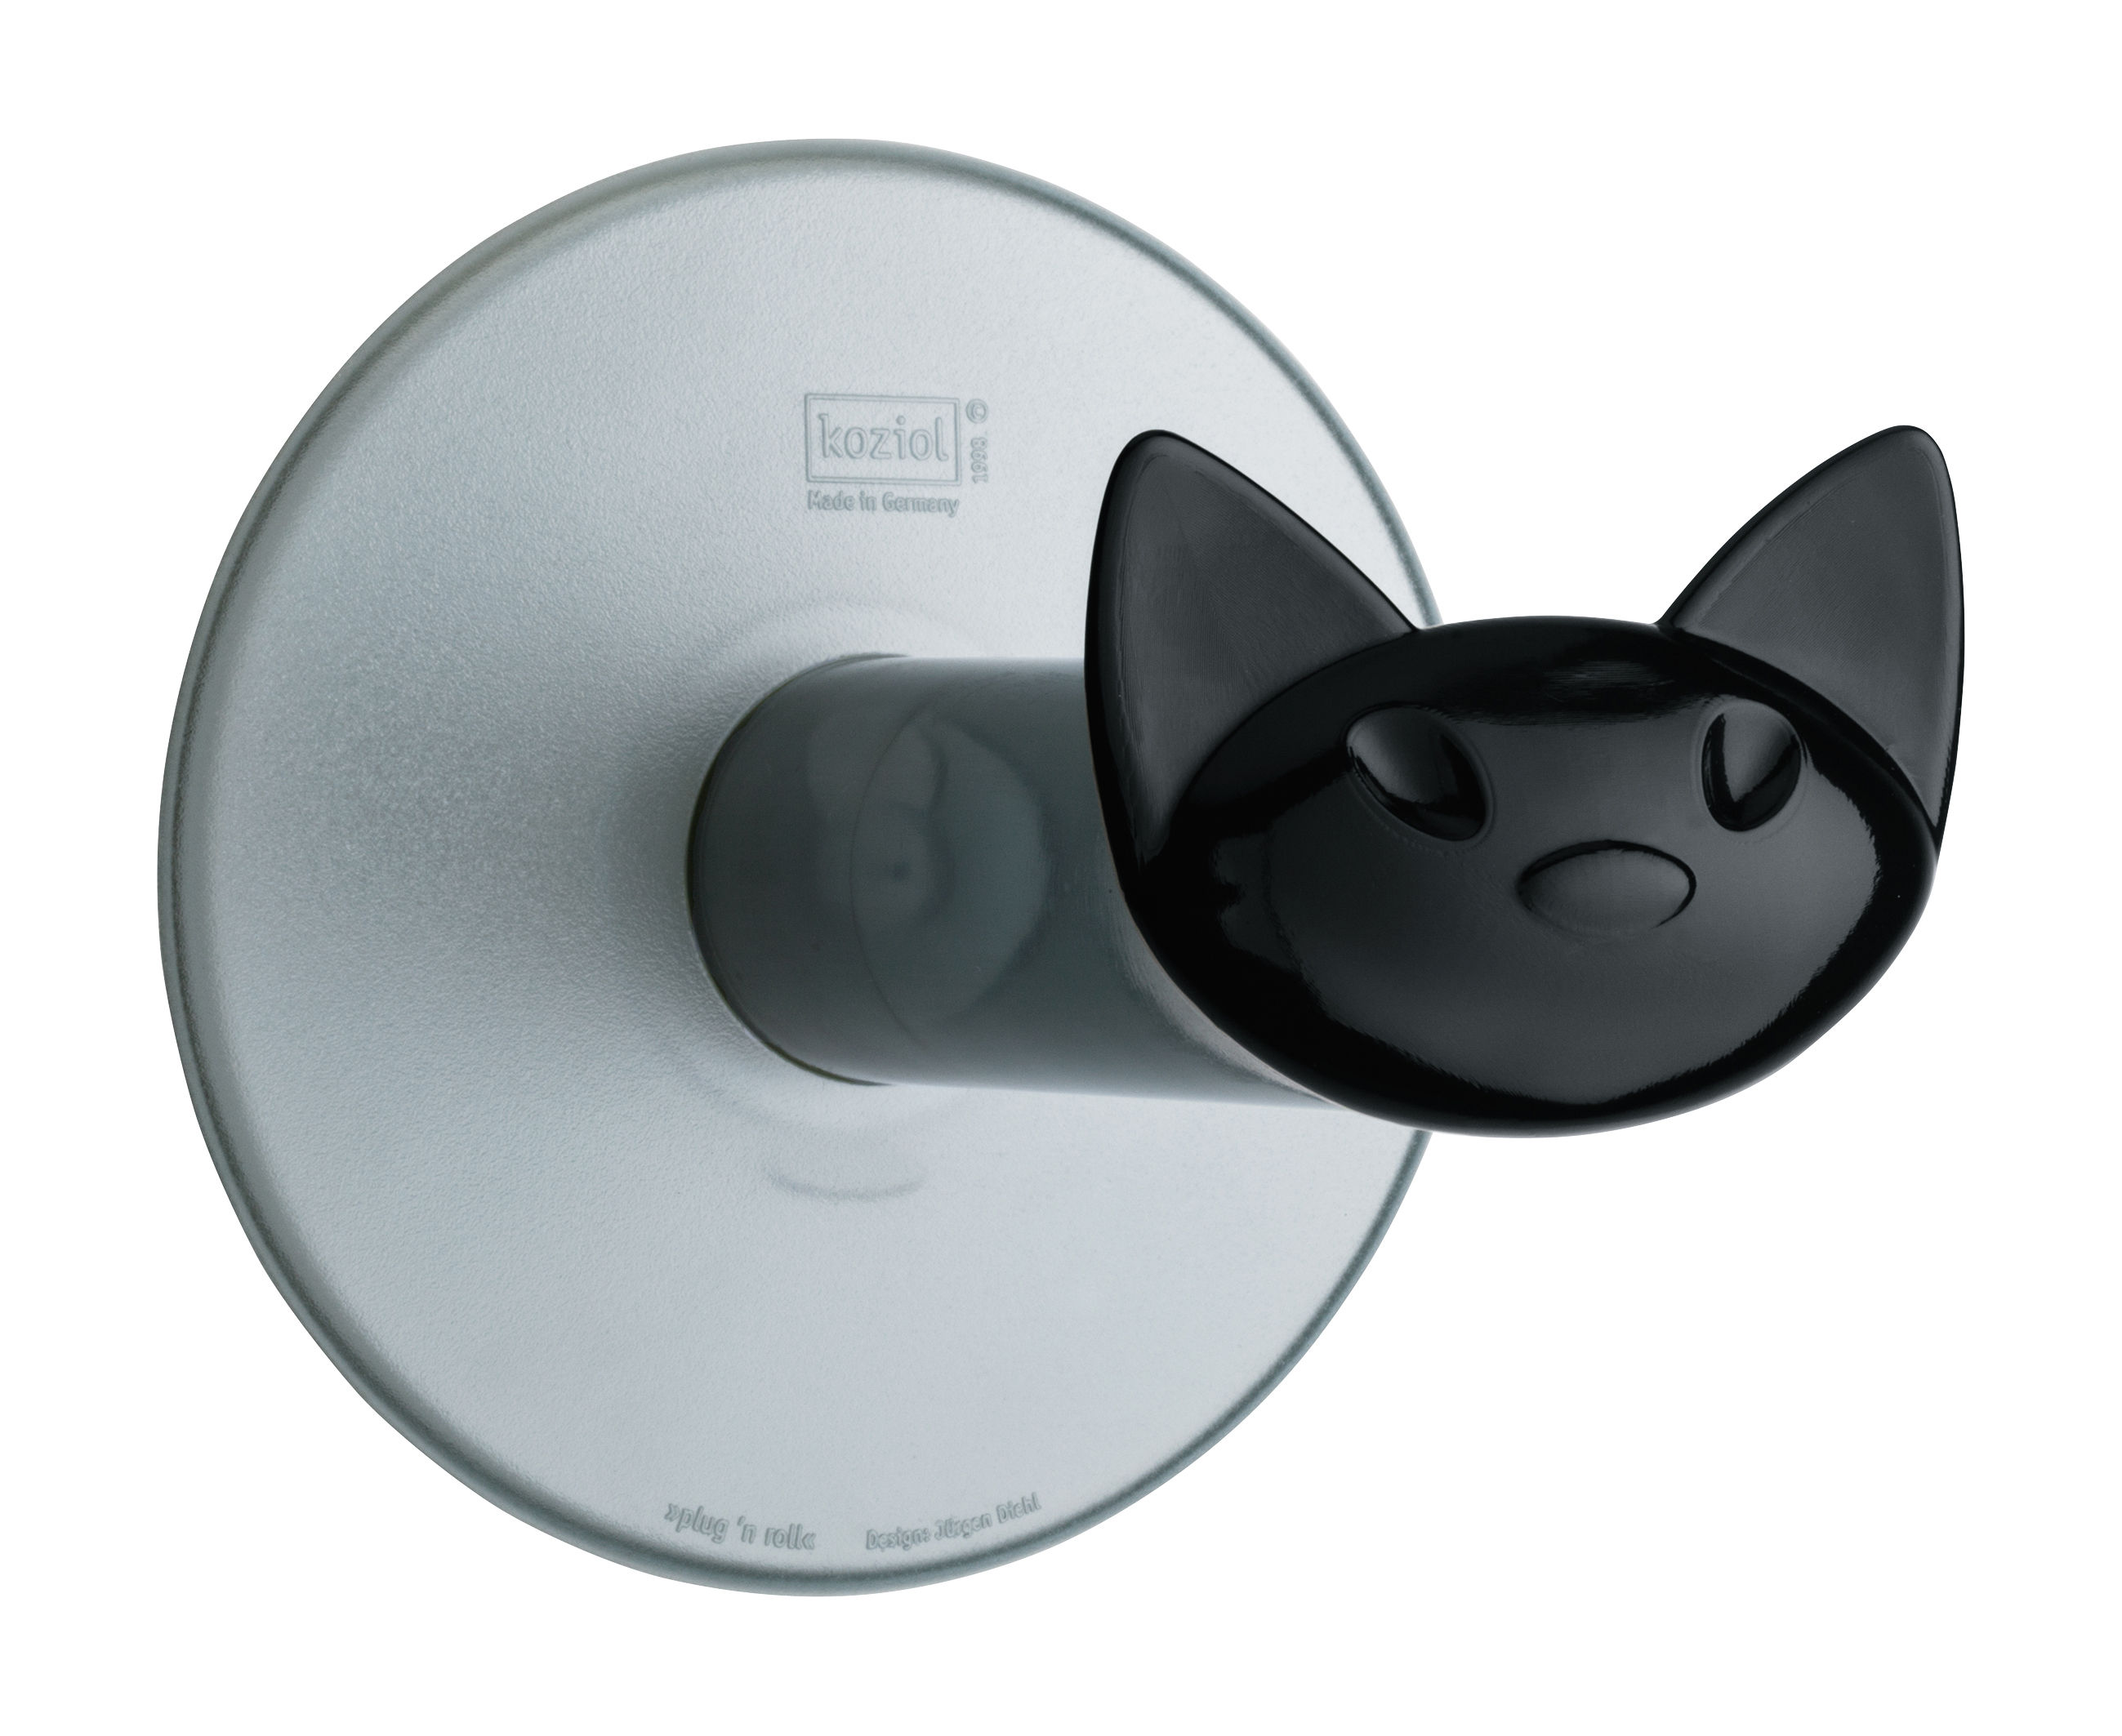 miaou toilettenpapierhalter mit saugnapf anthrazit transparent griff schwarz by koziol. Black Bedroom Furniture Sets. Home Design Ideas